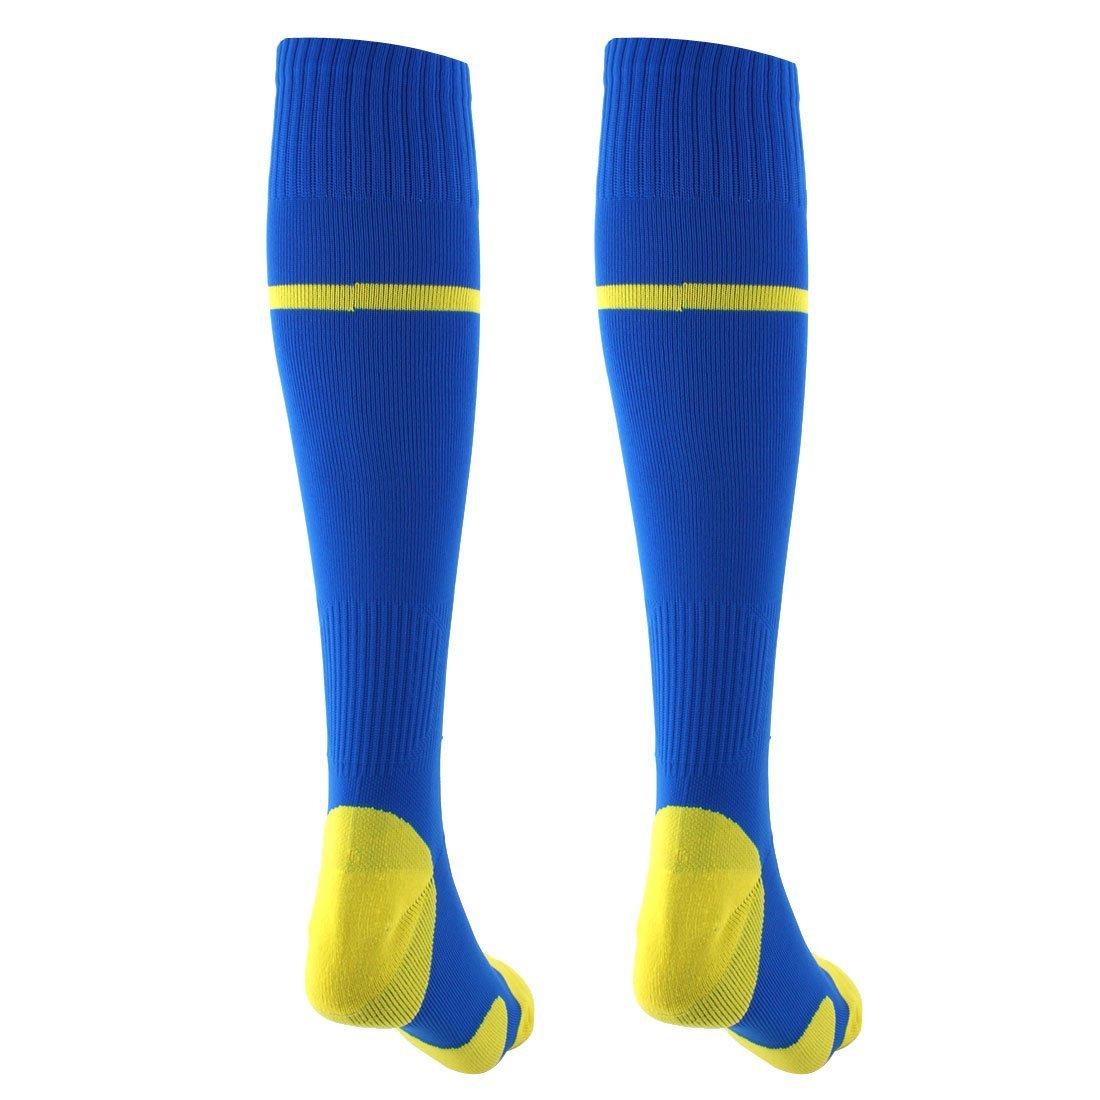 Amazon.com : eDealMax de Nylon, actividades al aire Libre, Rodilla, elástico Rugby Fútbol Fútbol Formación calcetines Par : Sports & Outdoors